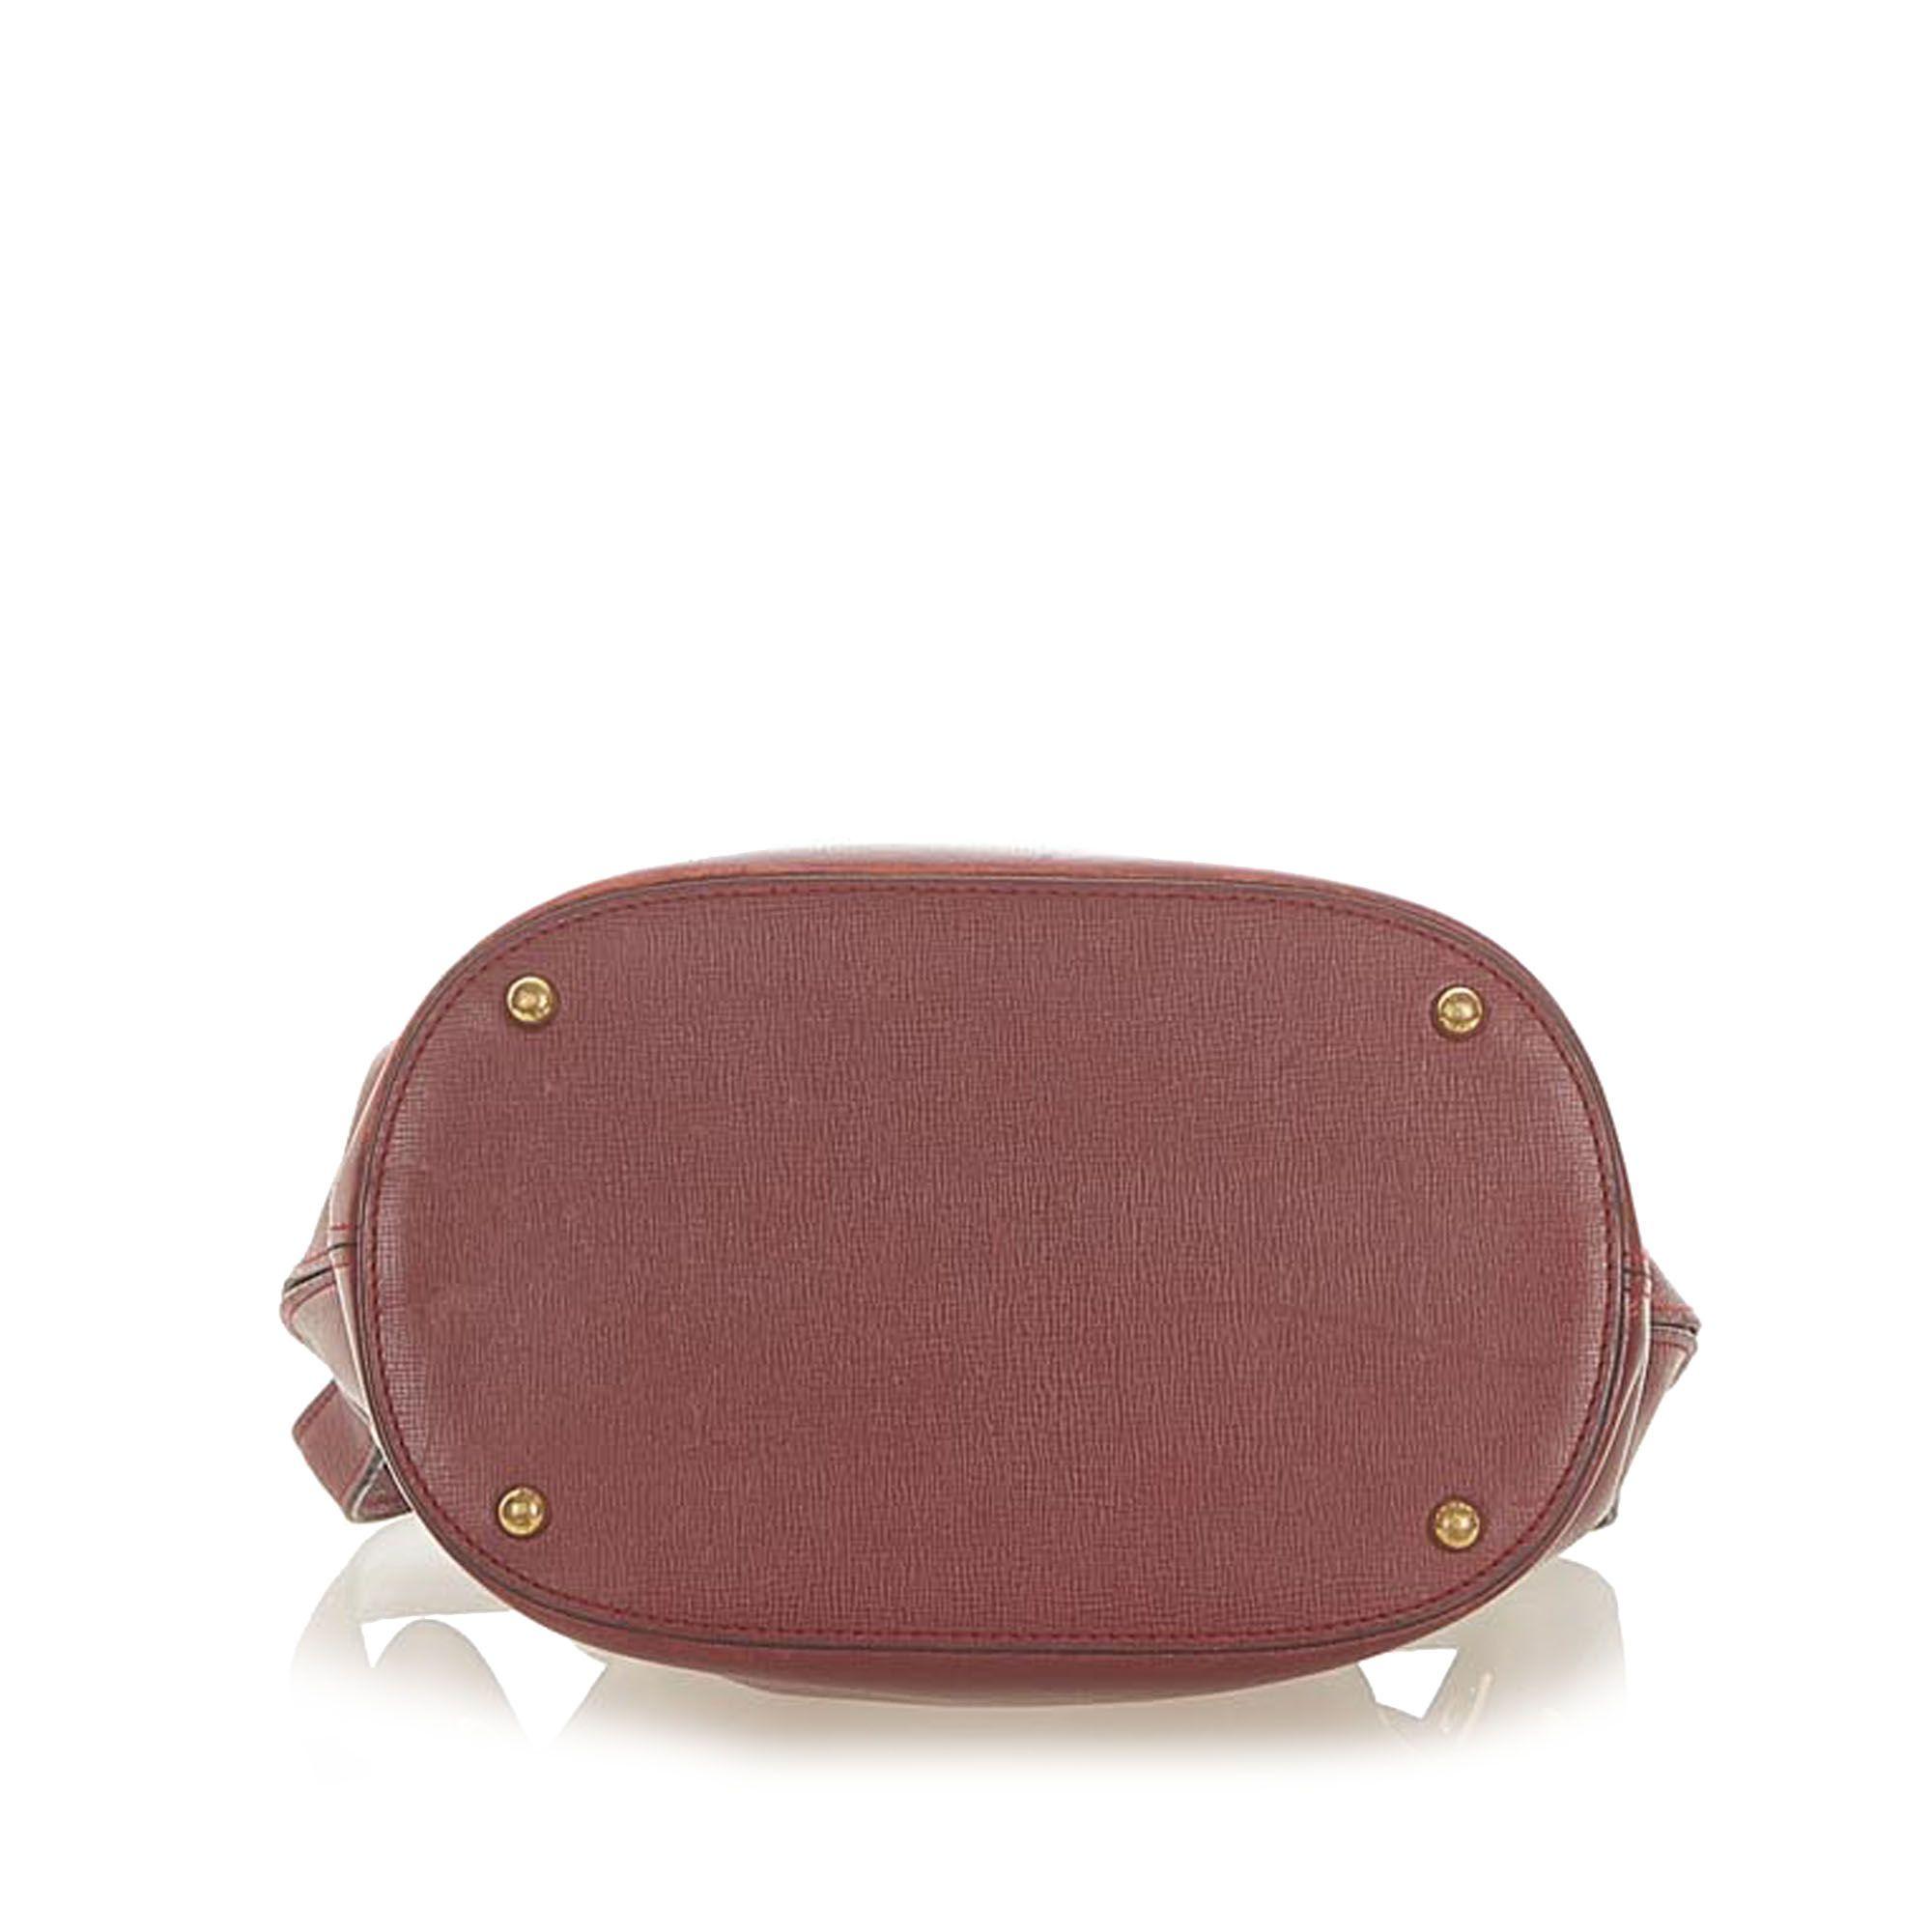 Vintage Cartier Must de Cartier Leather Bucket Bag Red